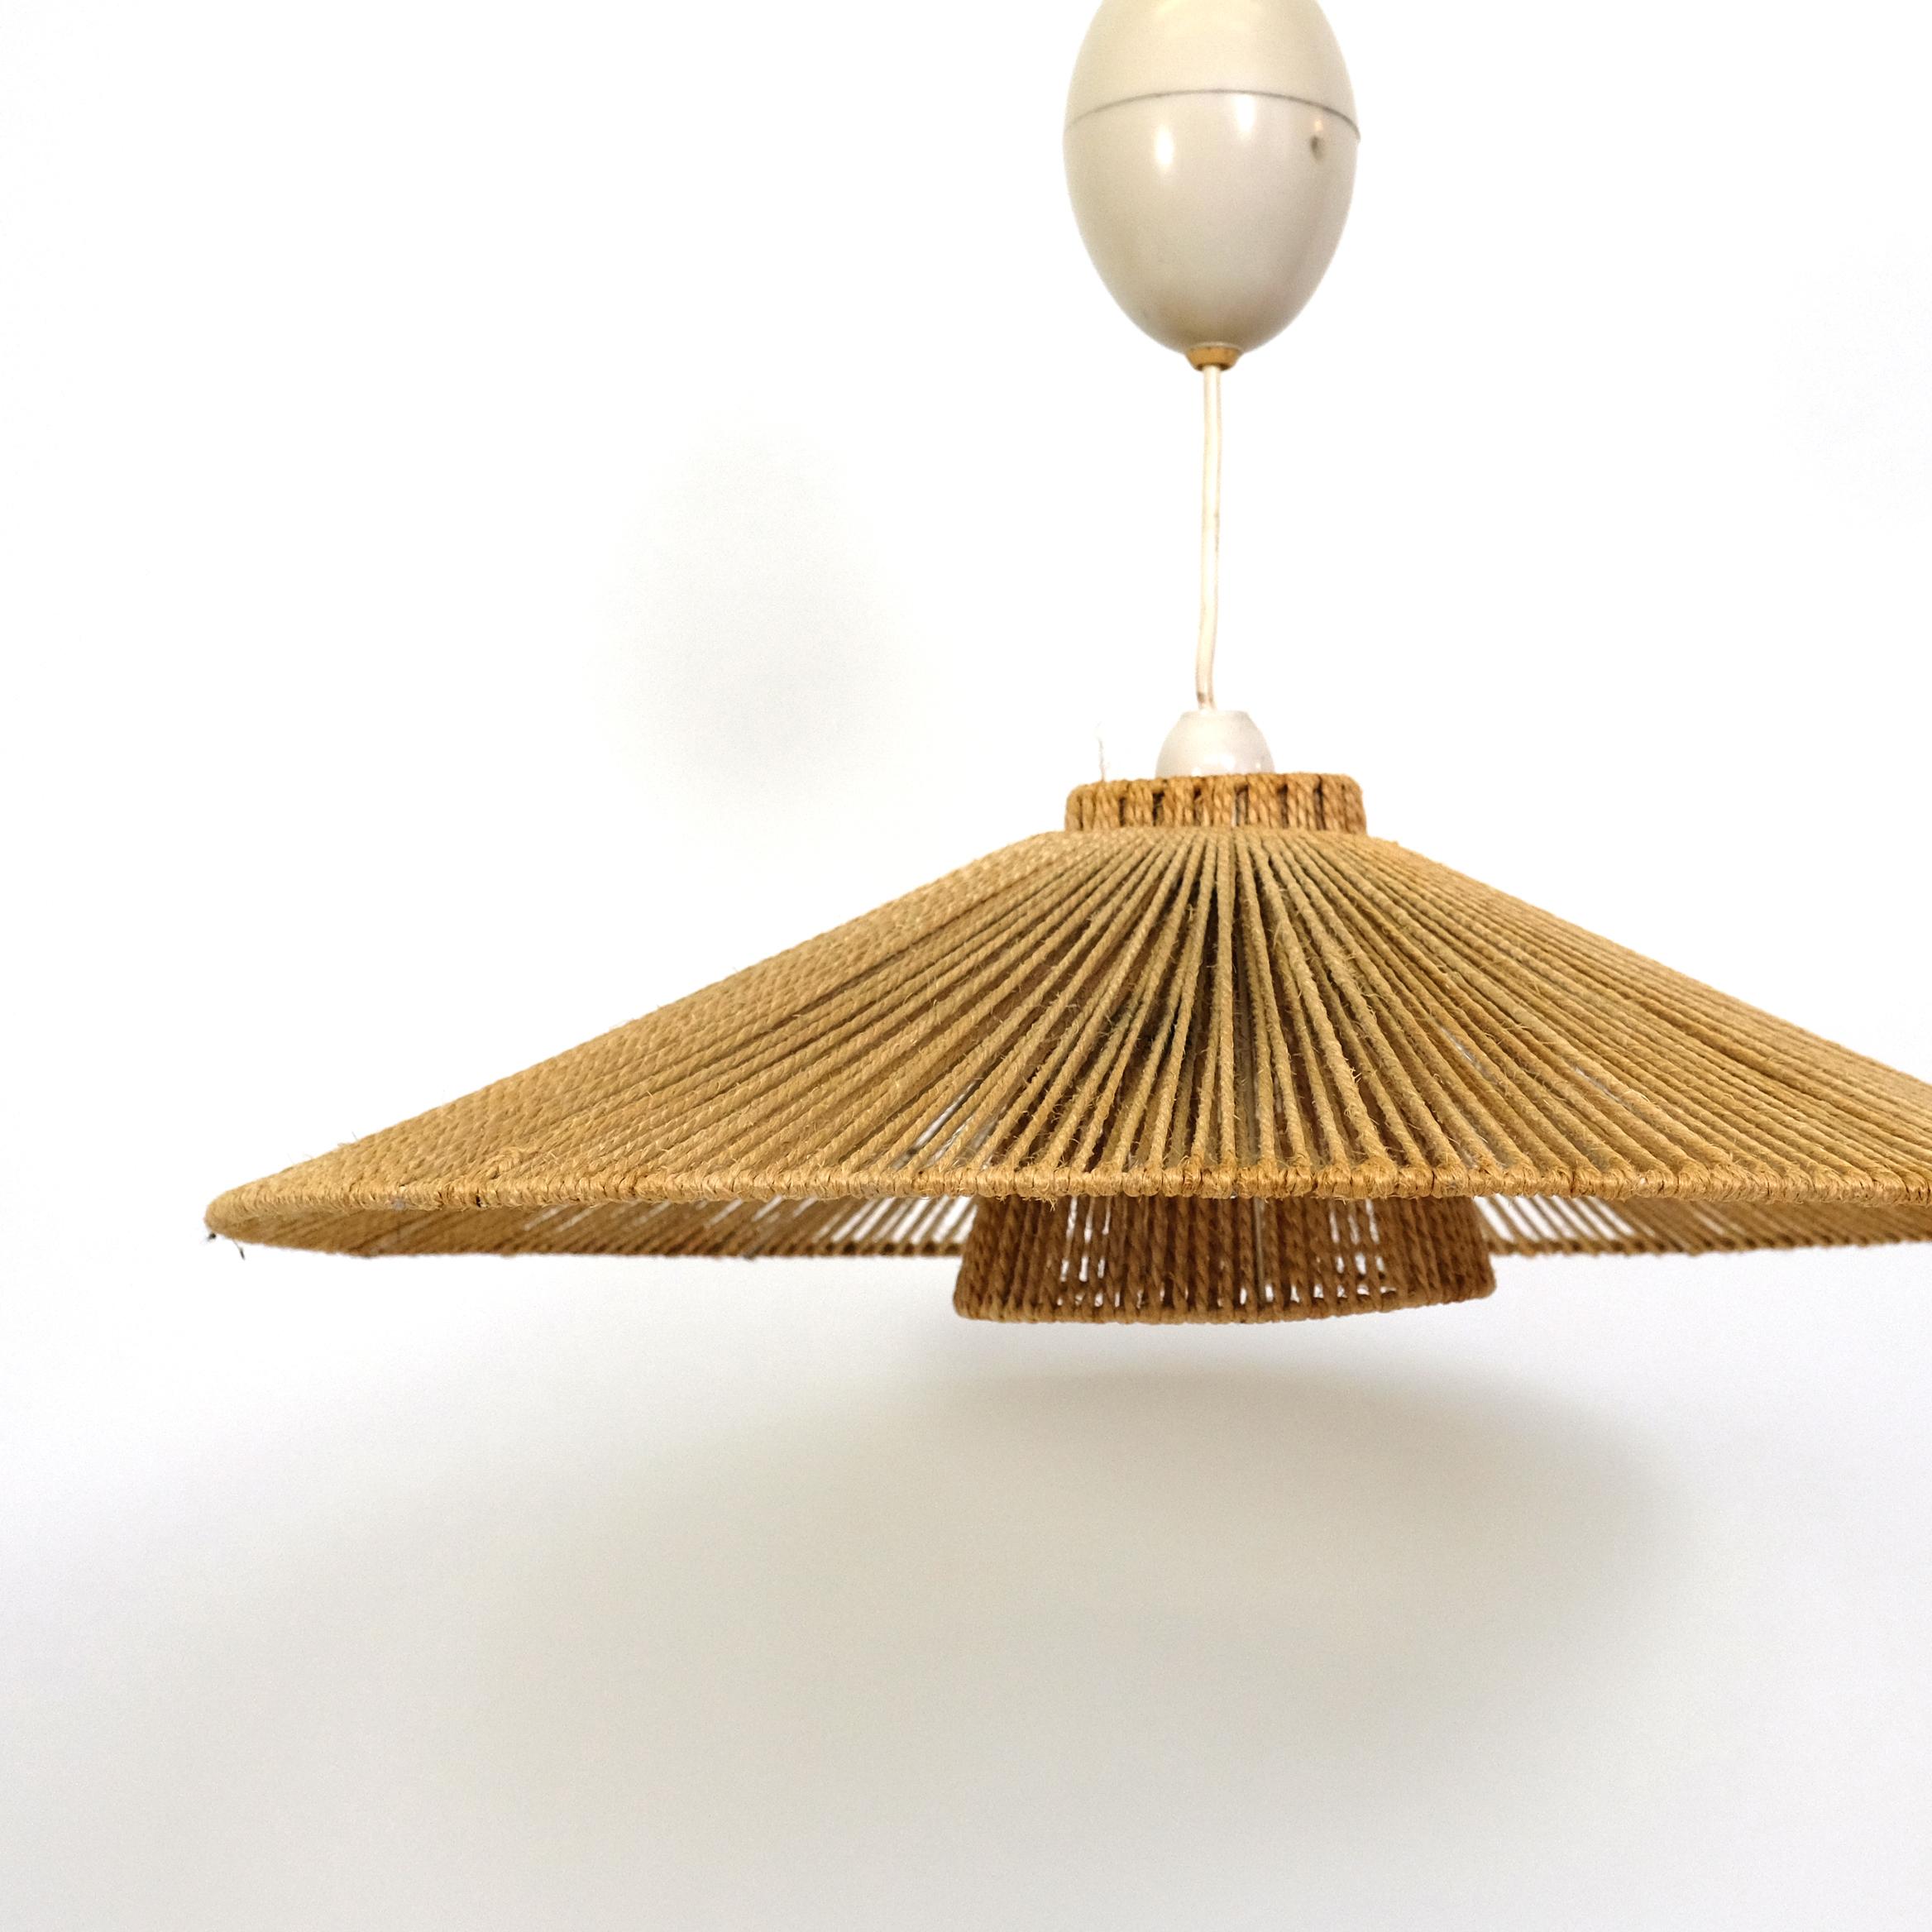 Lamp by Ib Fabiansen